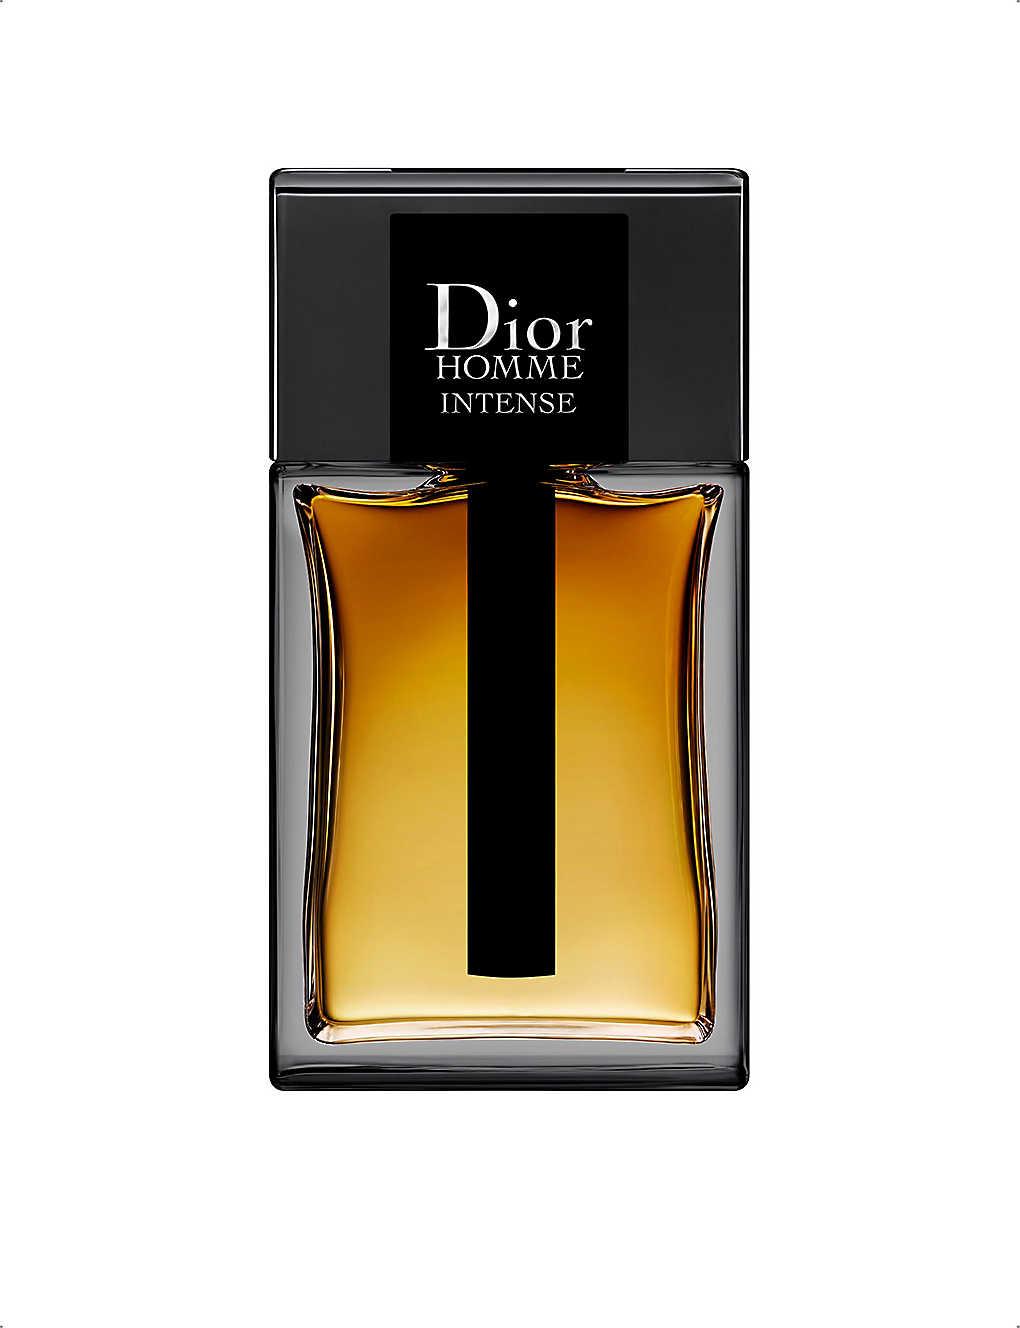 Dior Dior Homme Intense Eau De Parfum 100ml Selfridgescom